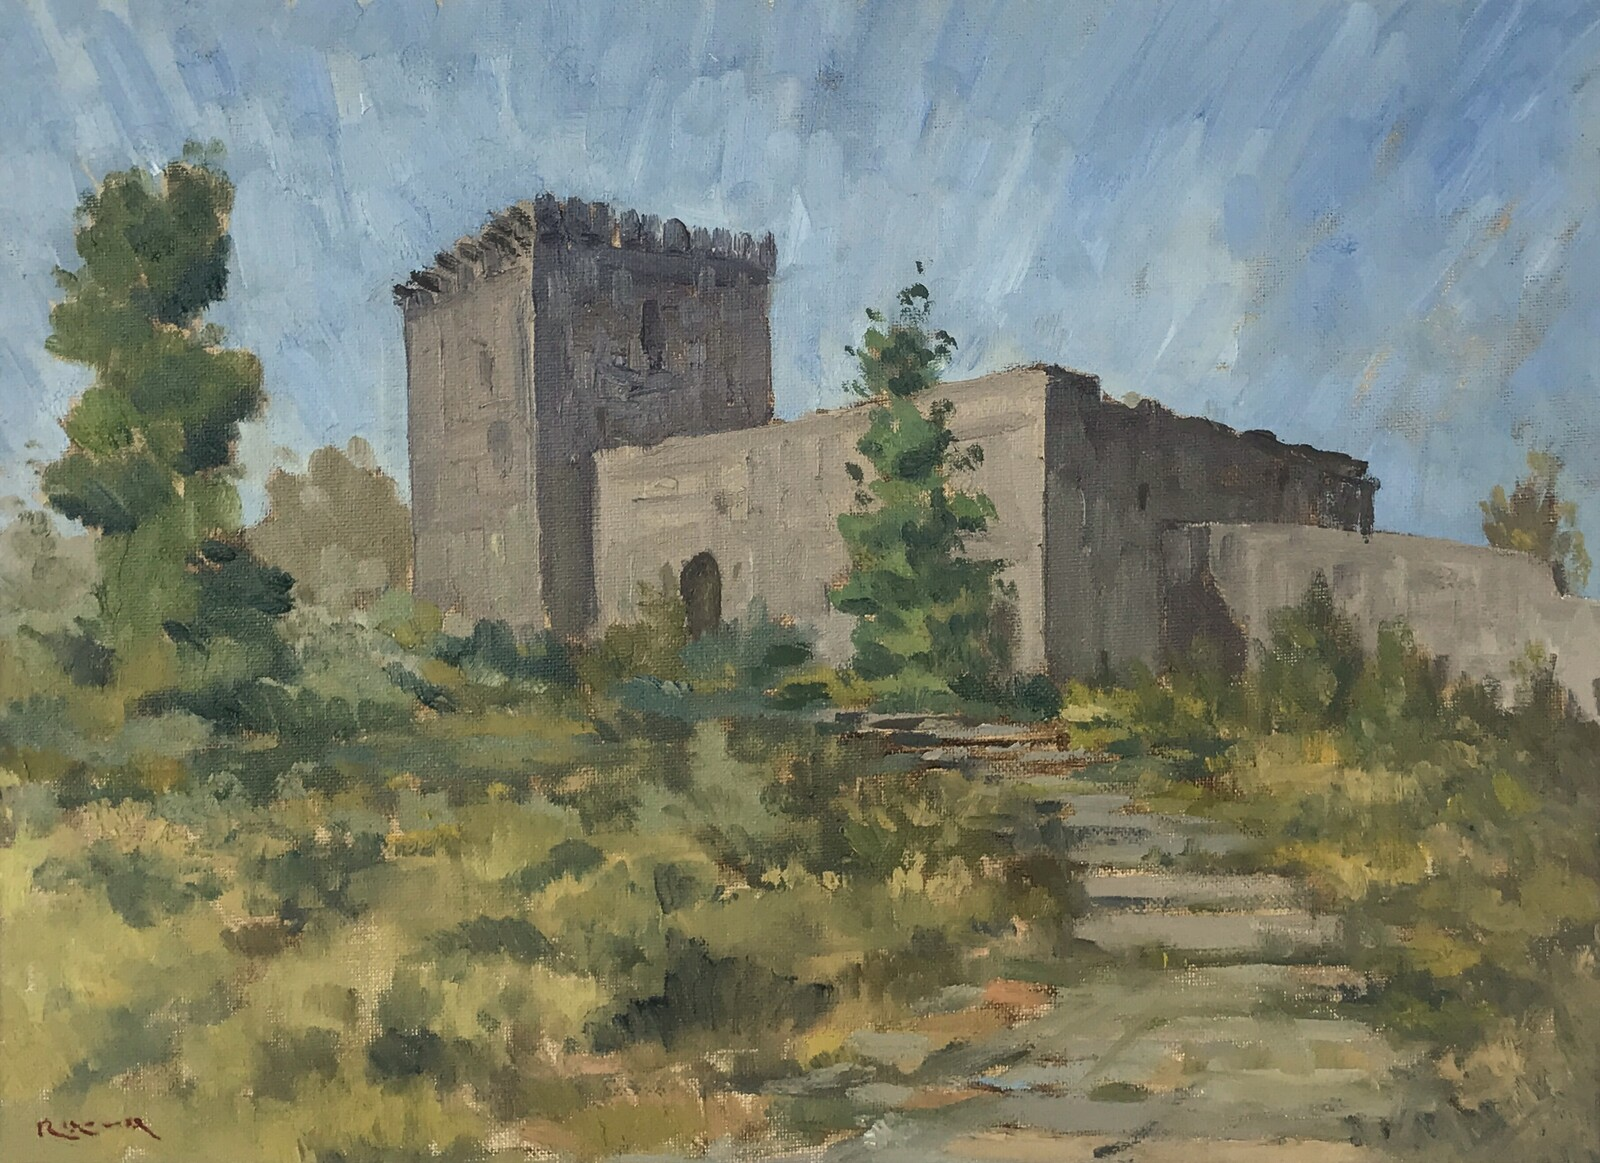 Monforte Castle, Portugal